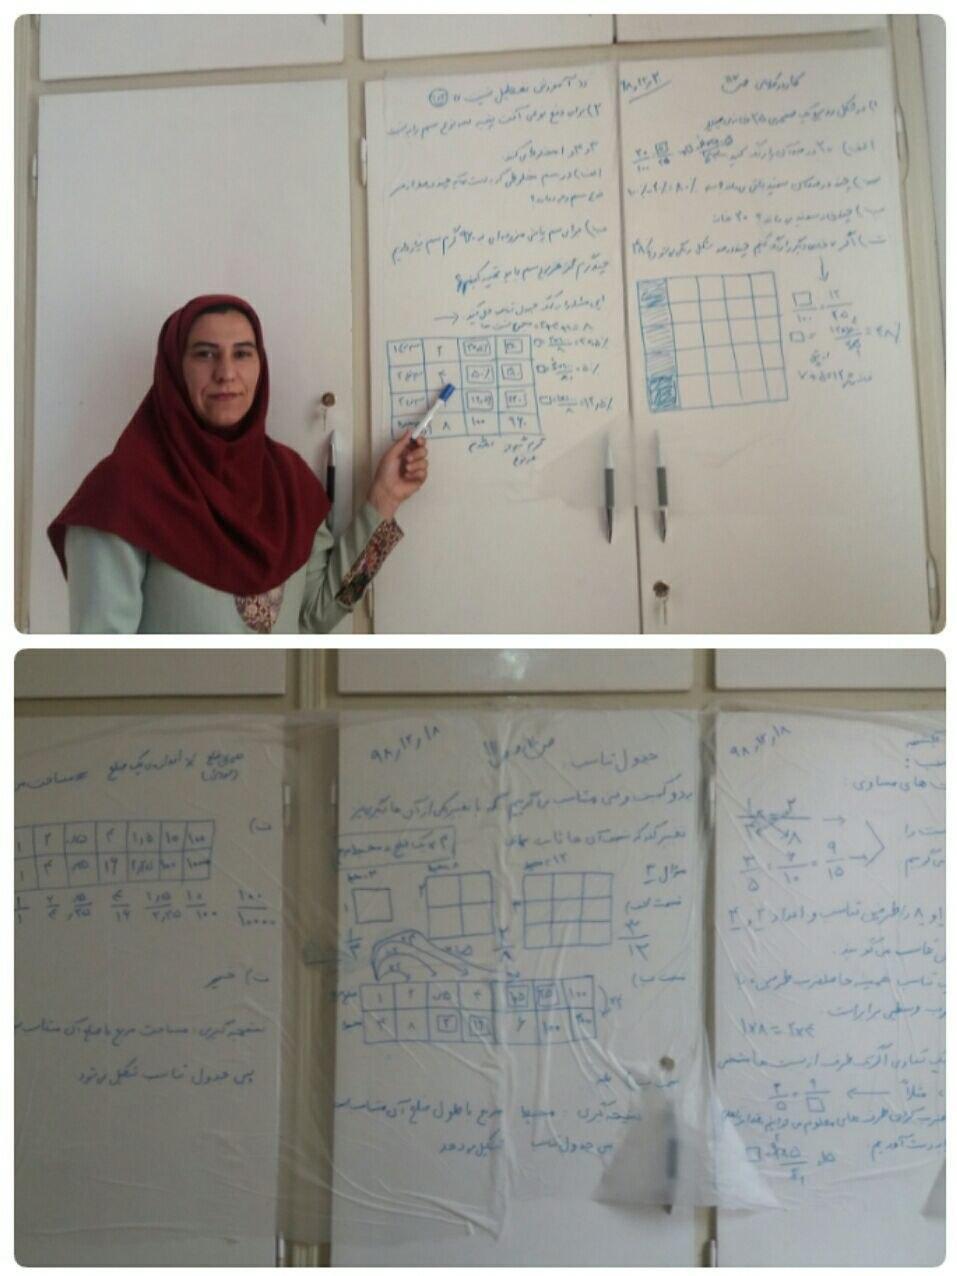 Teachers Adapting to Remote Teaching as COVID-19 Shuts Schools 3